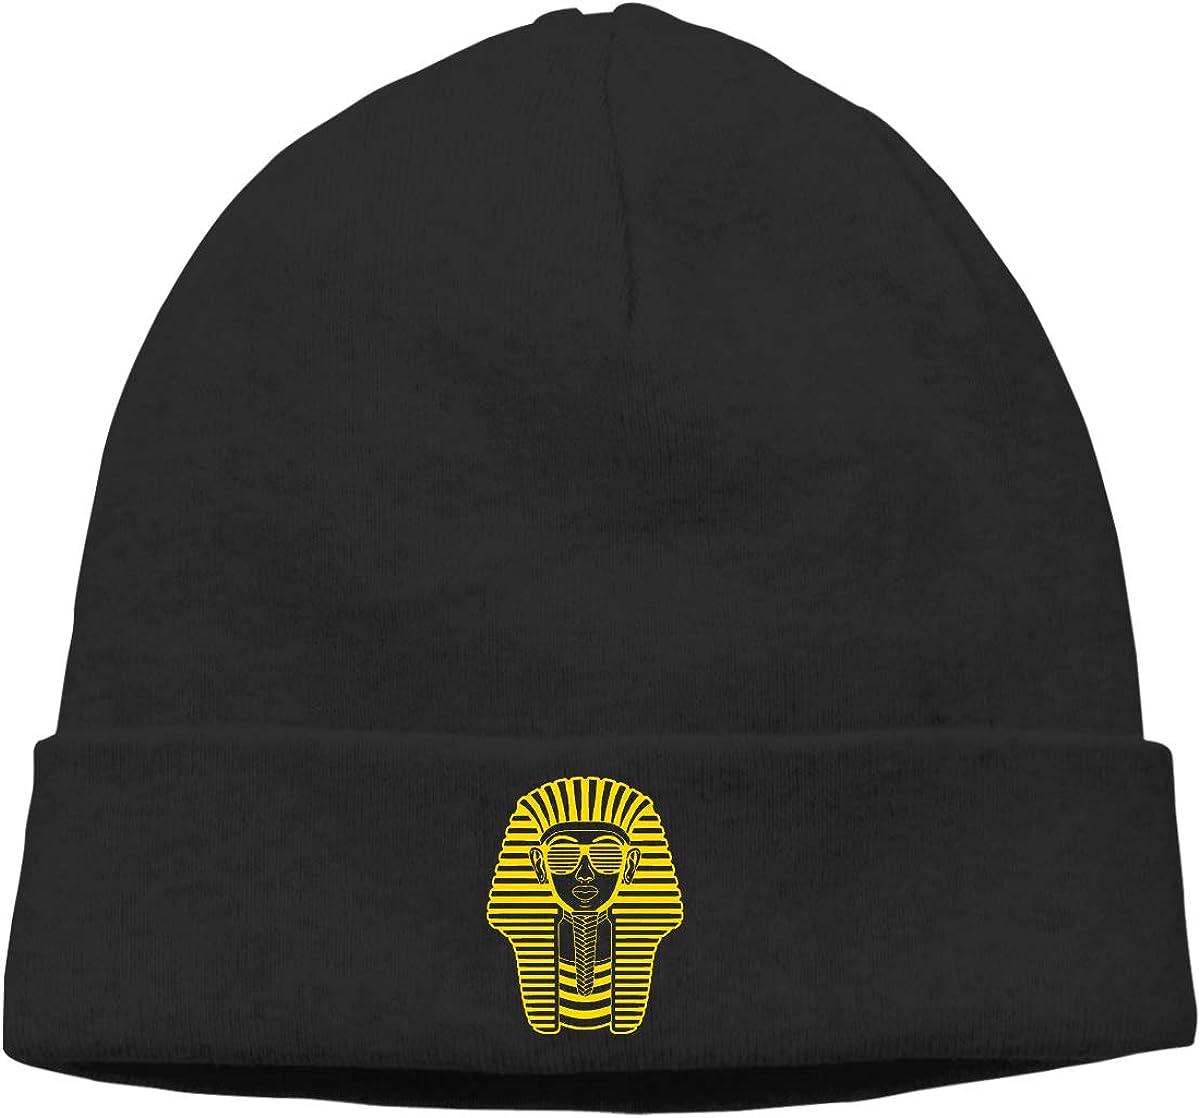 Nskngr Pharaoh of Egypt Printed Cap Unisex Cuffed Chunky Plain Skull Slouchy Beanie Hat